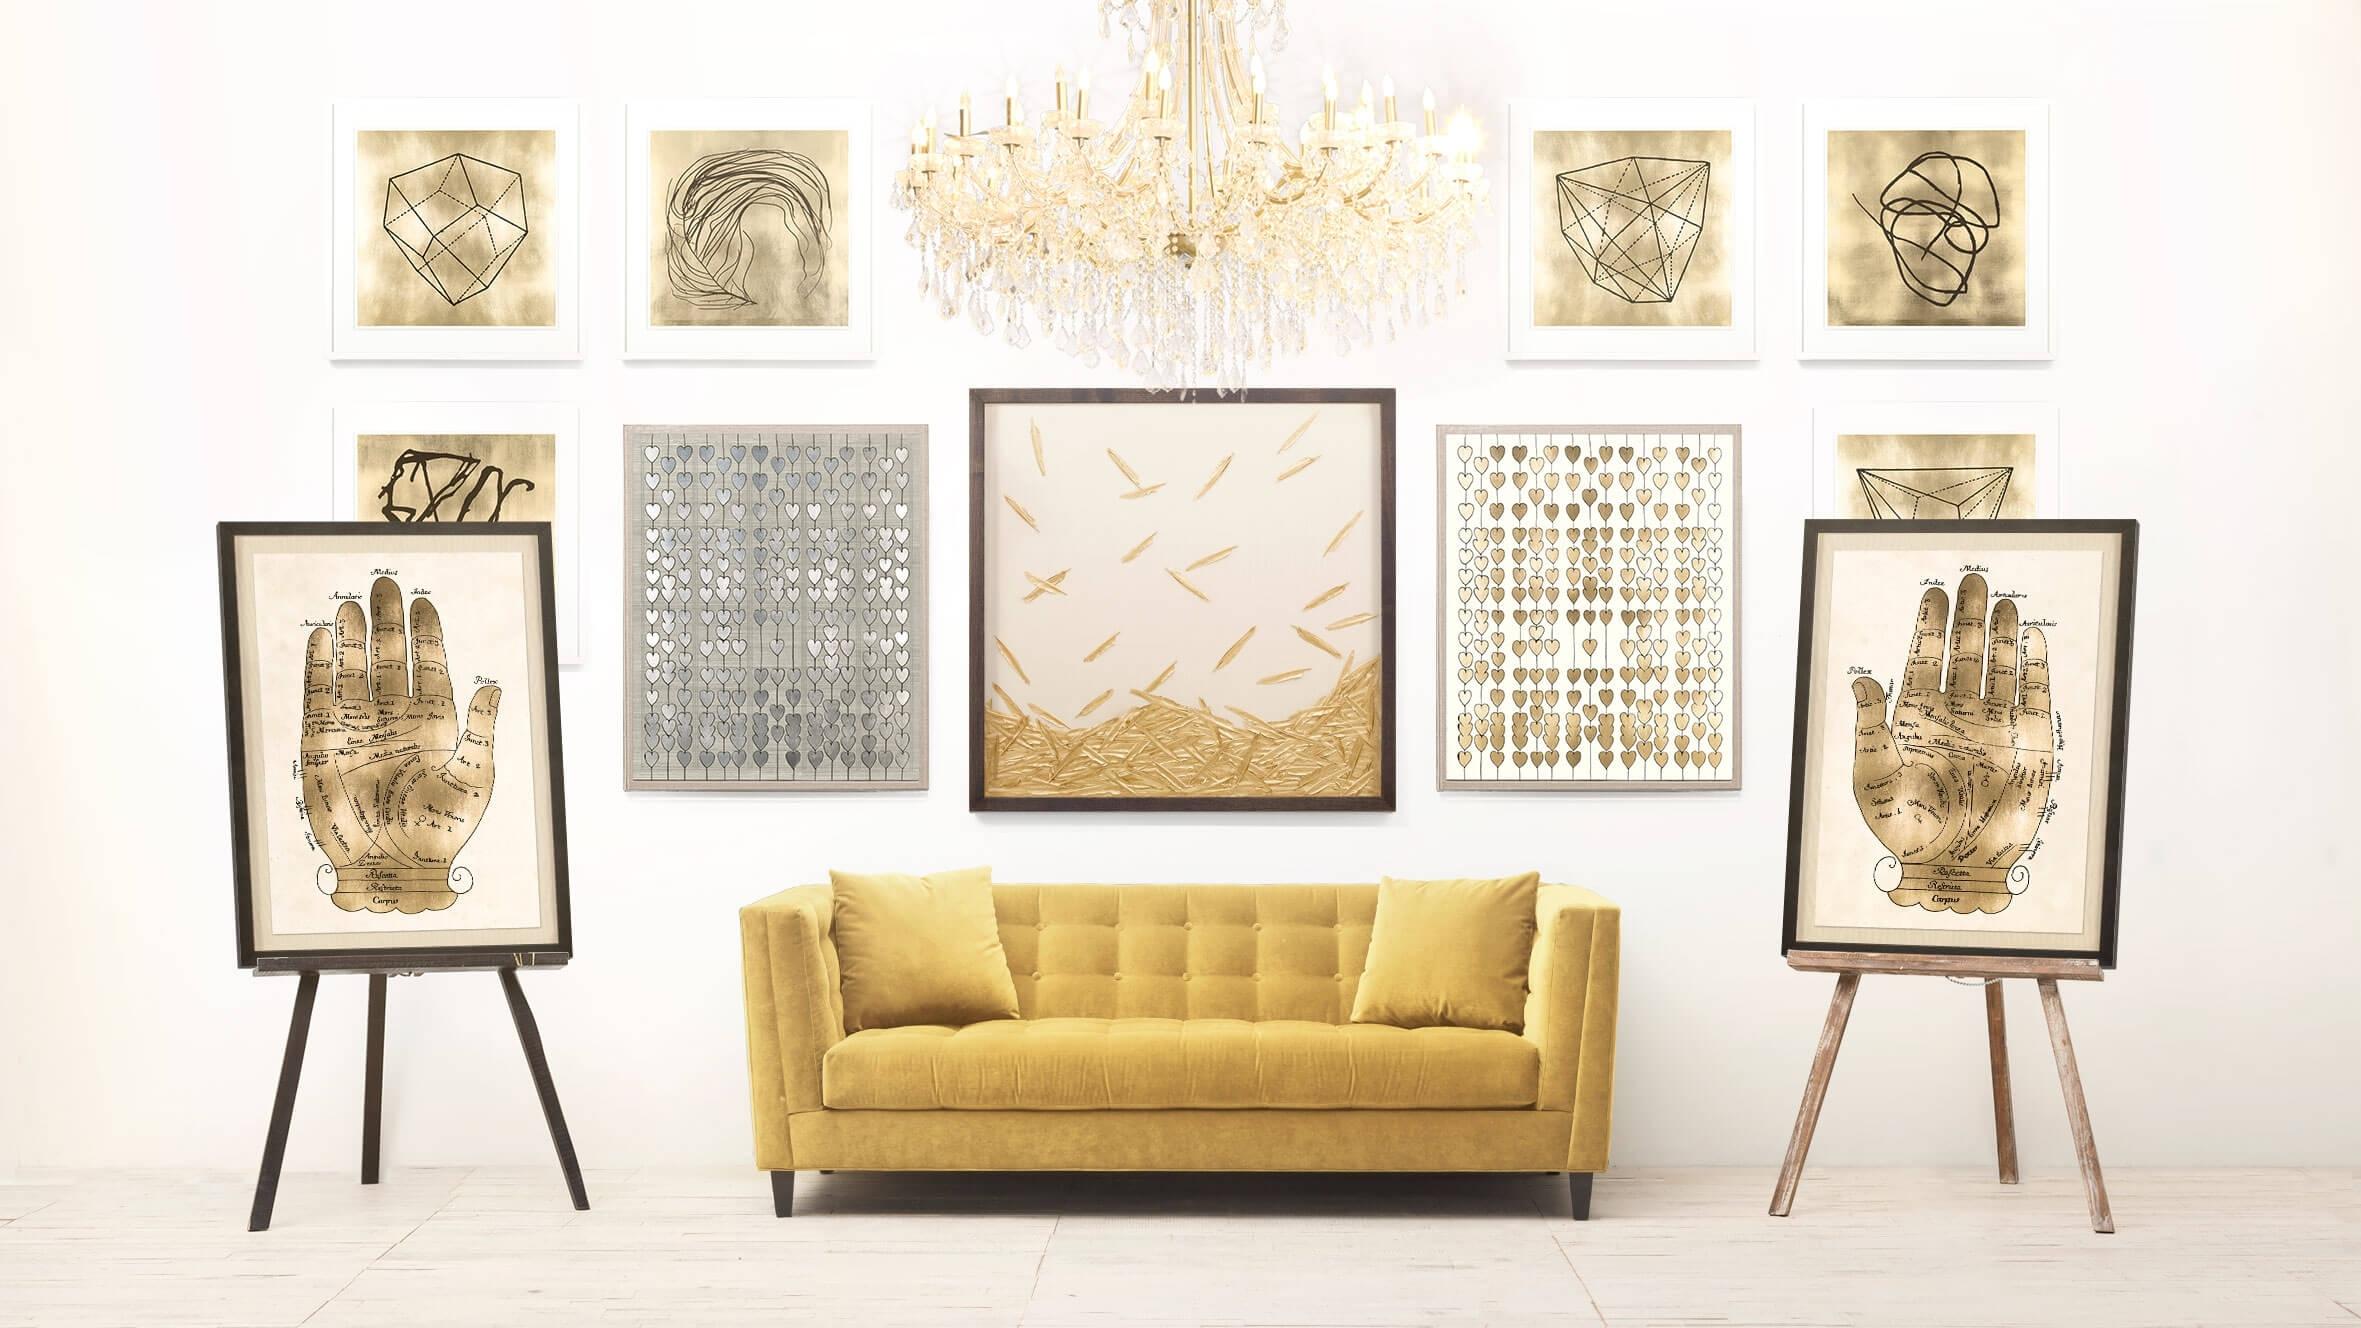 Wall Art Design Ideas: Gold Leaf Wall Art Targetartists Metal Regarding Latest Canvas Wall Art At Target (View 6 of 15)